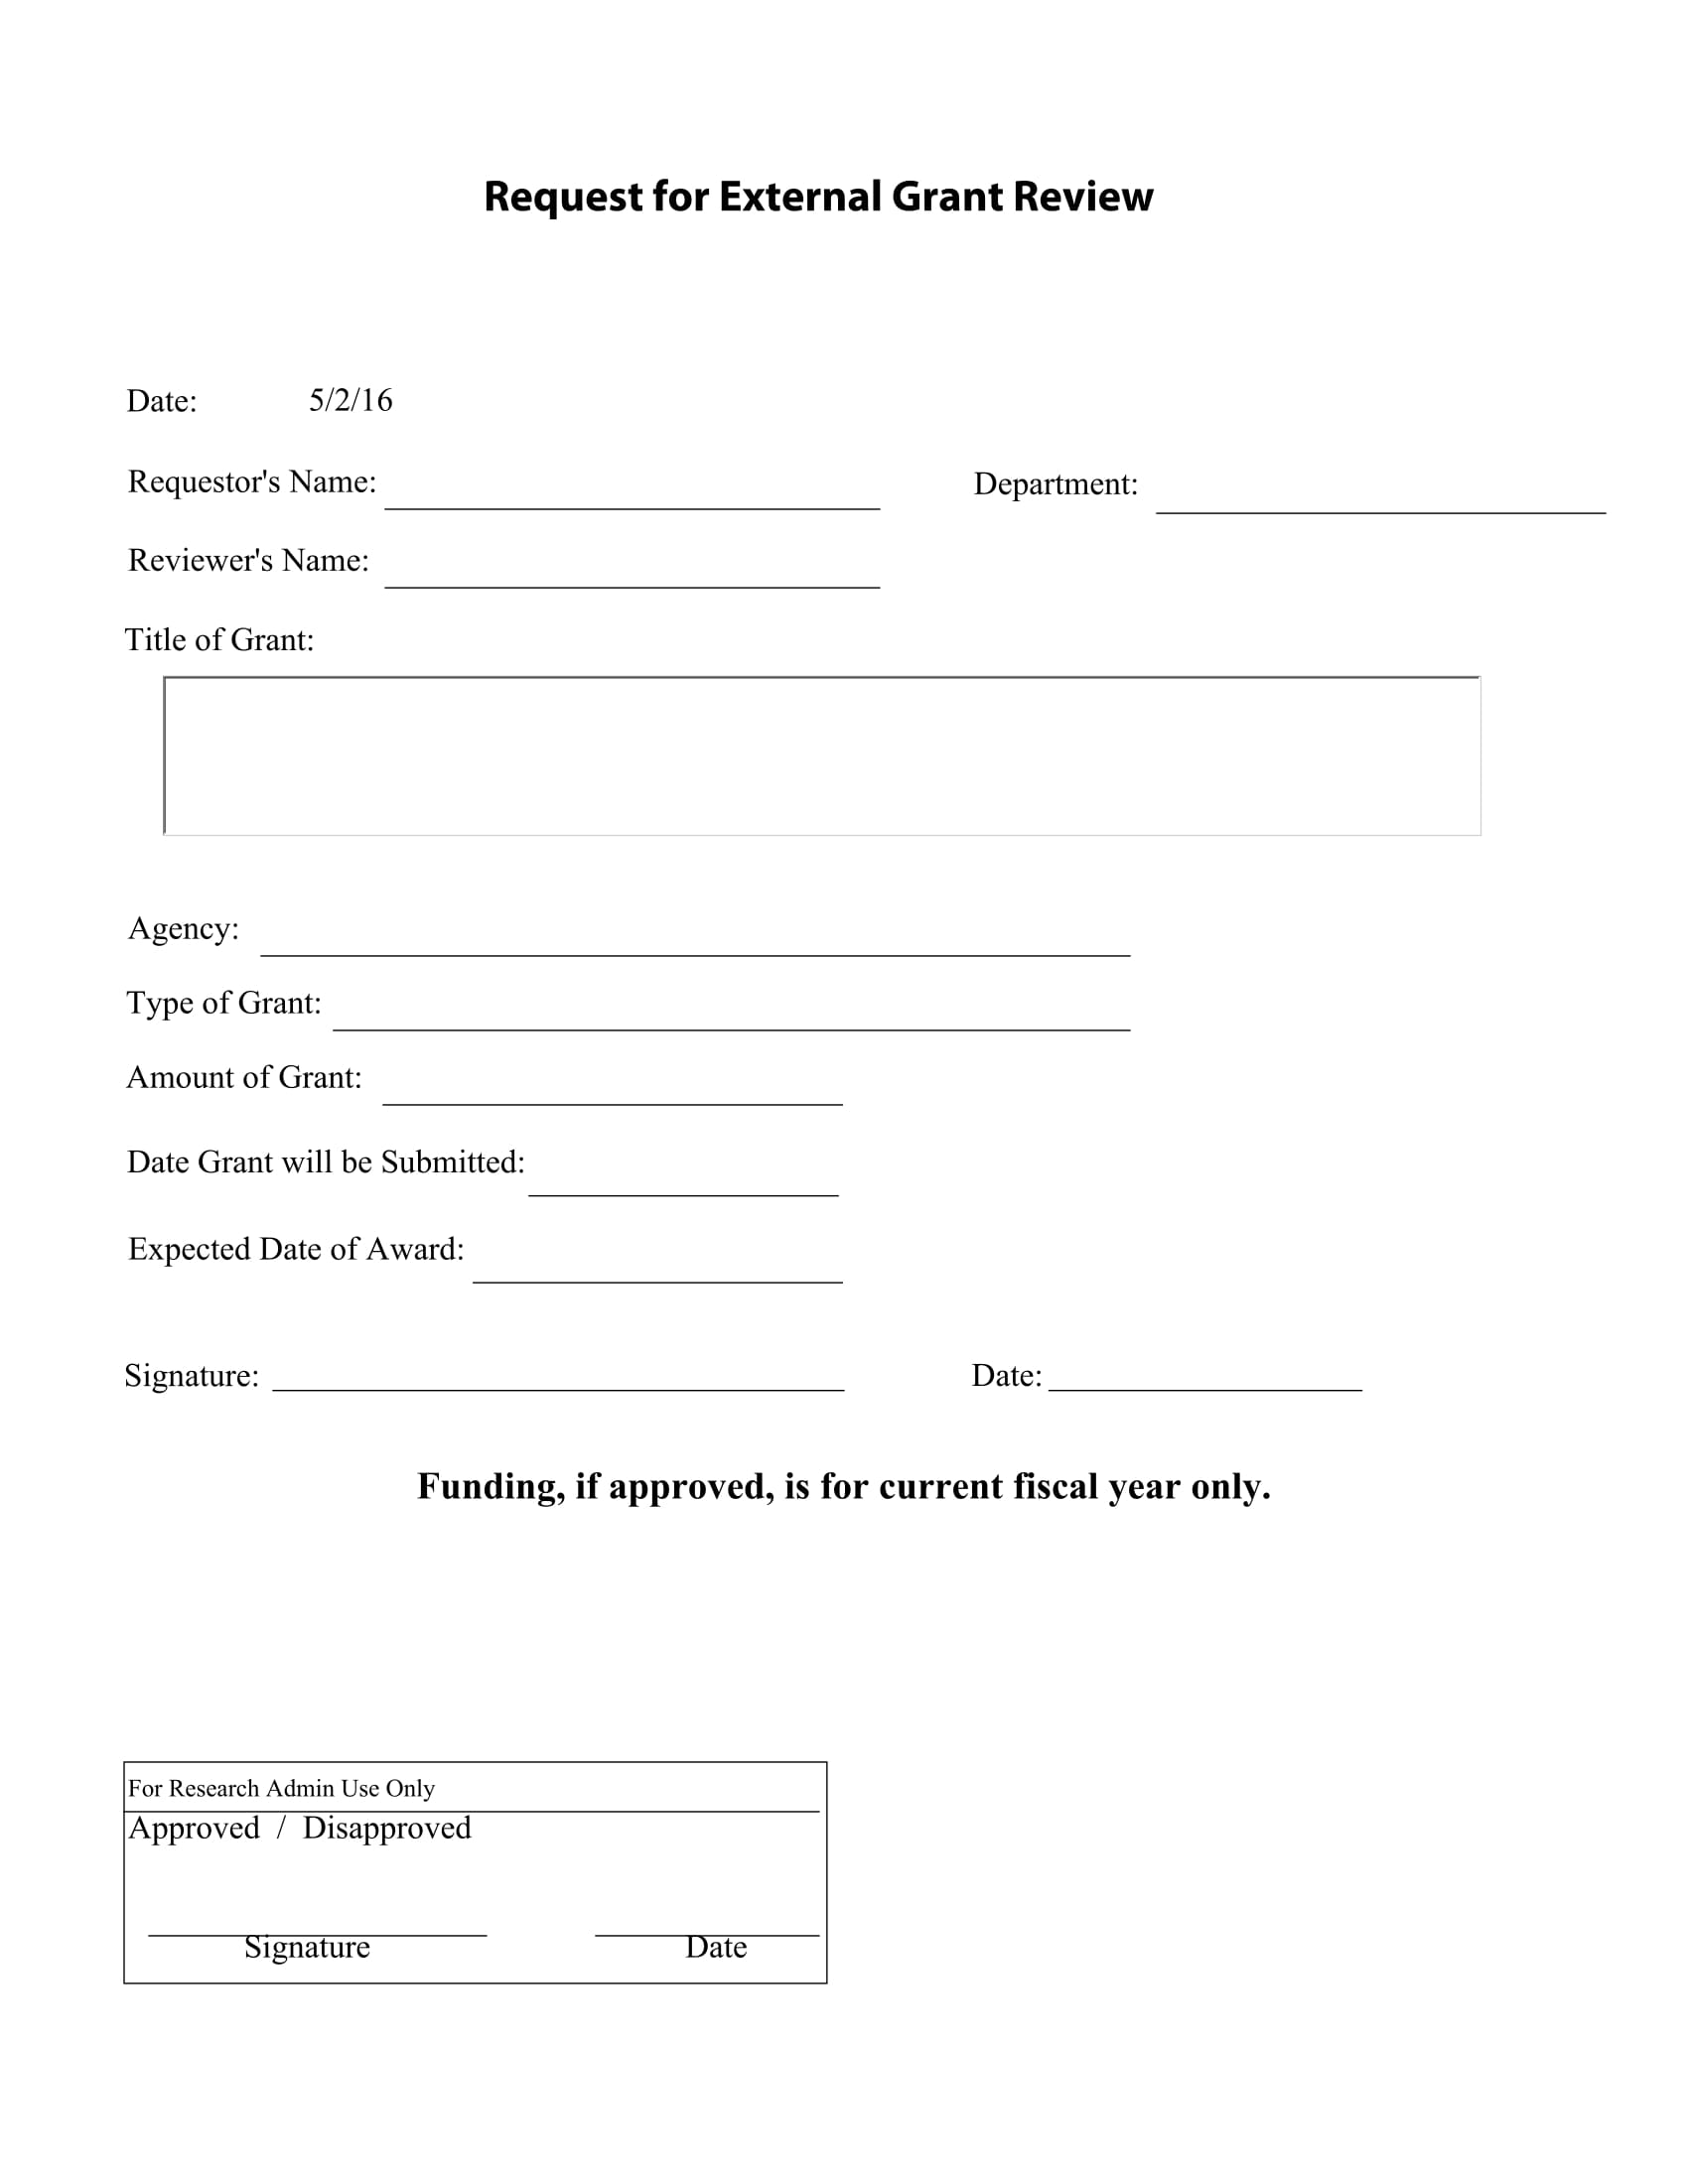 external grant review form 1